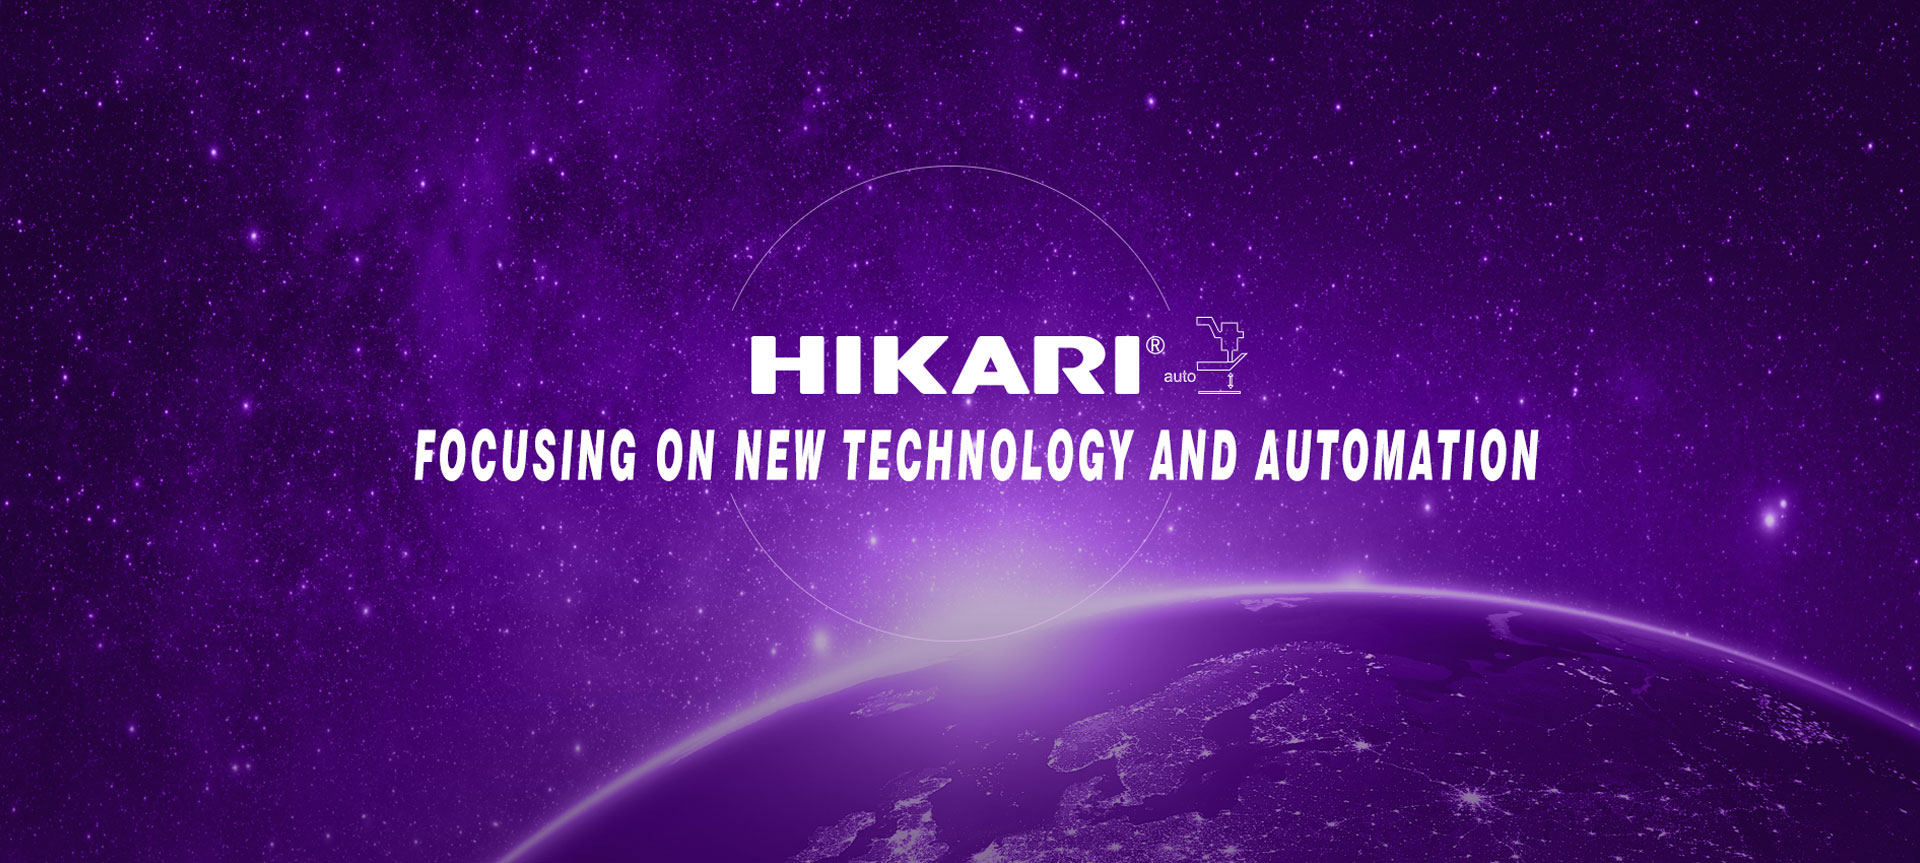 HIKARI• Positioning